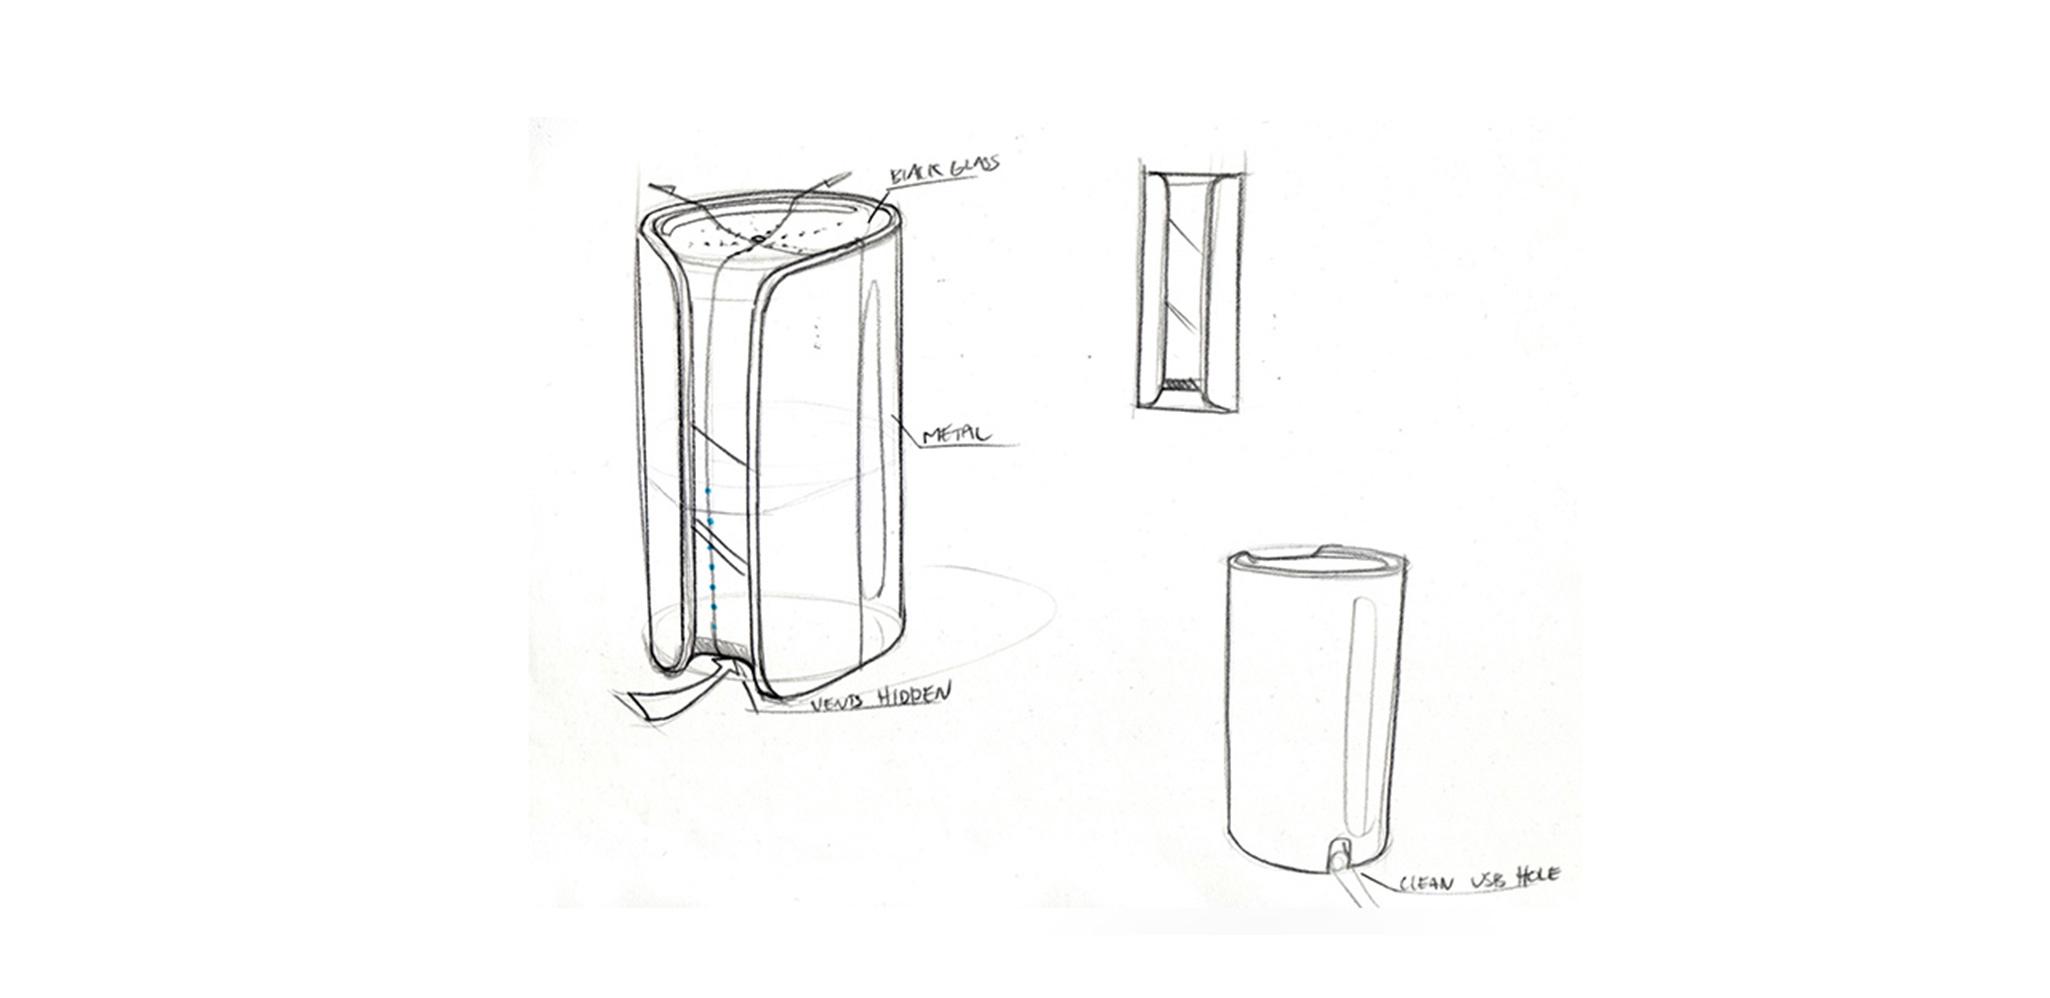 canary_product-design_02.jpg